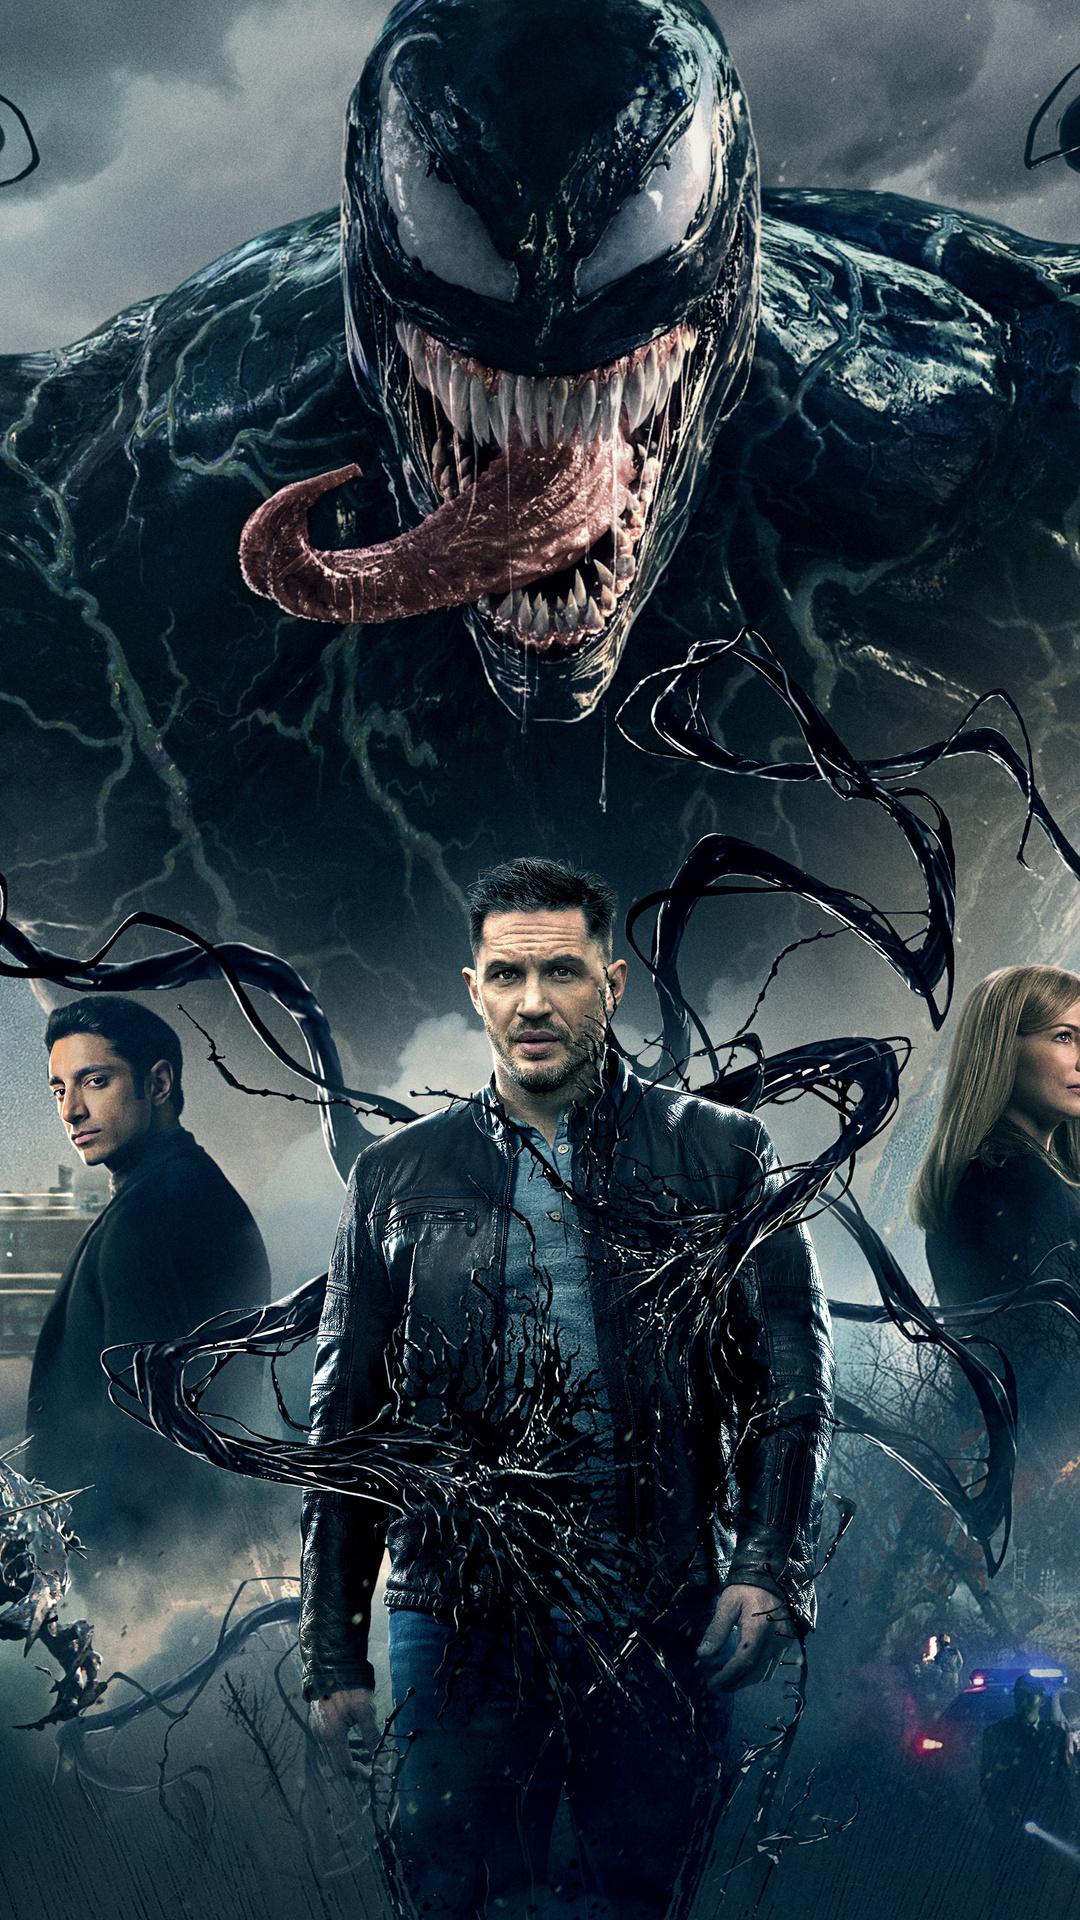 1080x1920 Venom Movie 2018 8k Iphone 7,6s,6 Plus, Pixel xl ...